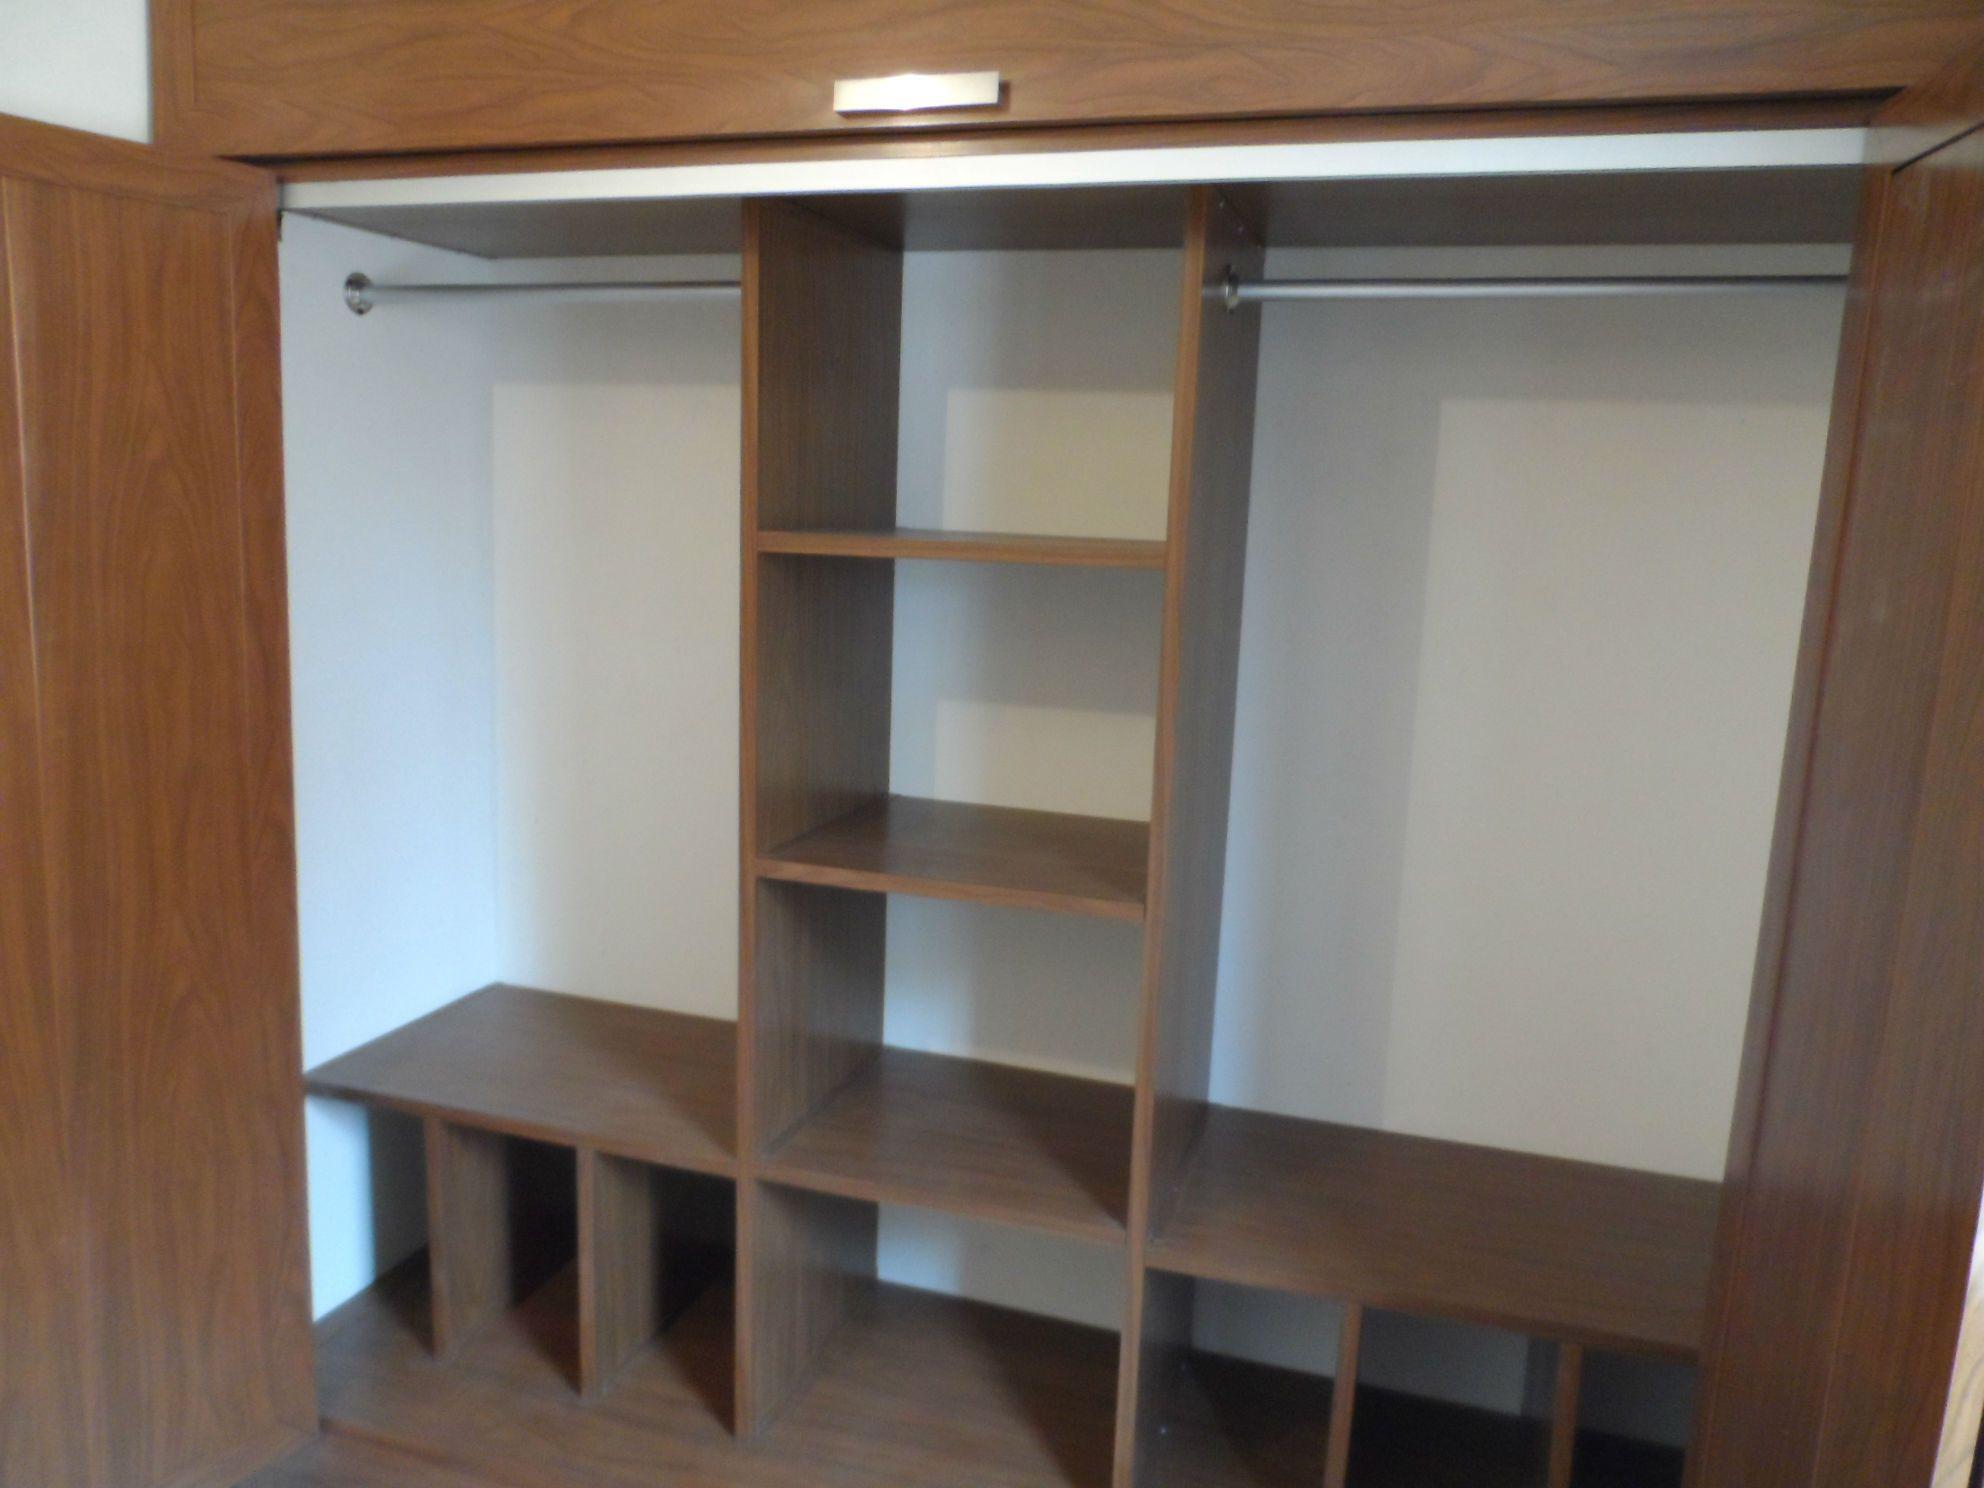 M s de 25 ideas incre bles sobre closet sencillos en - Planificador armarios ...